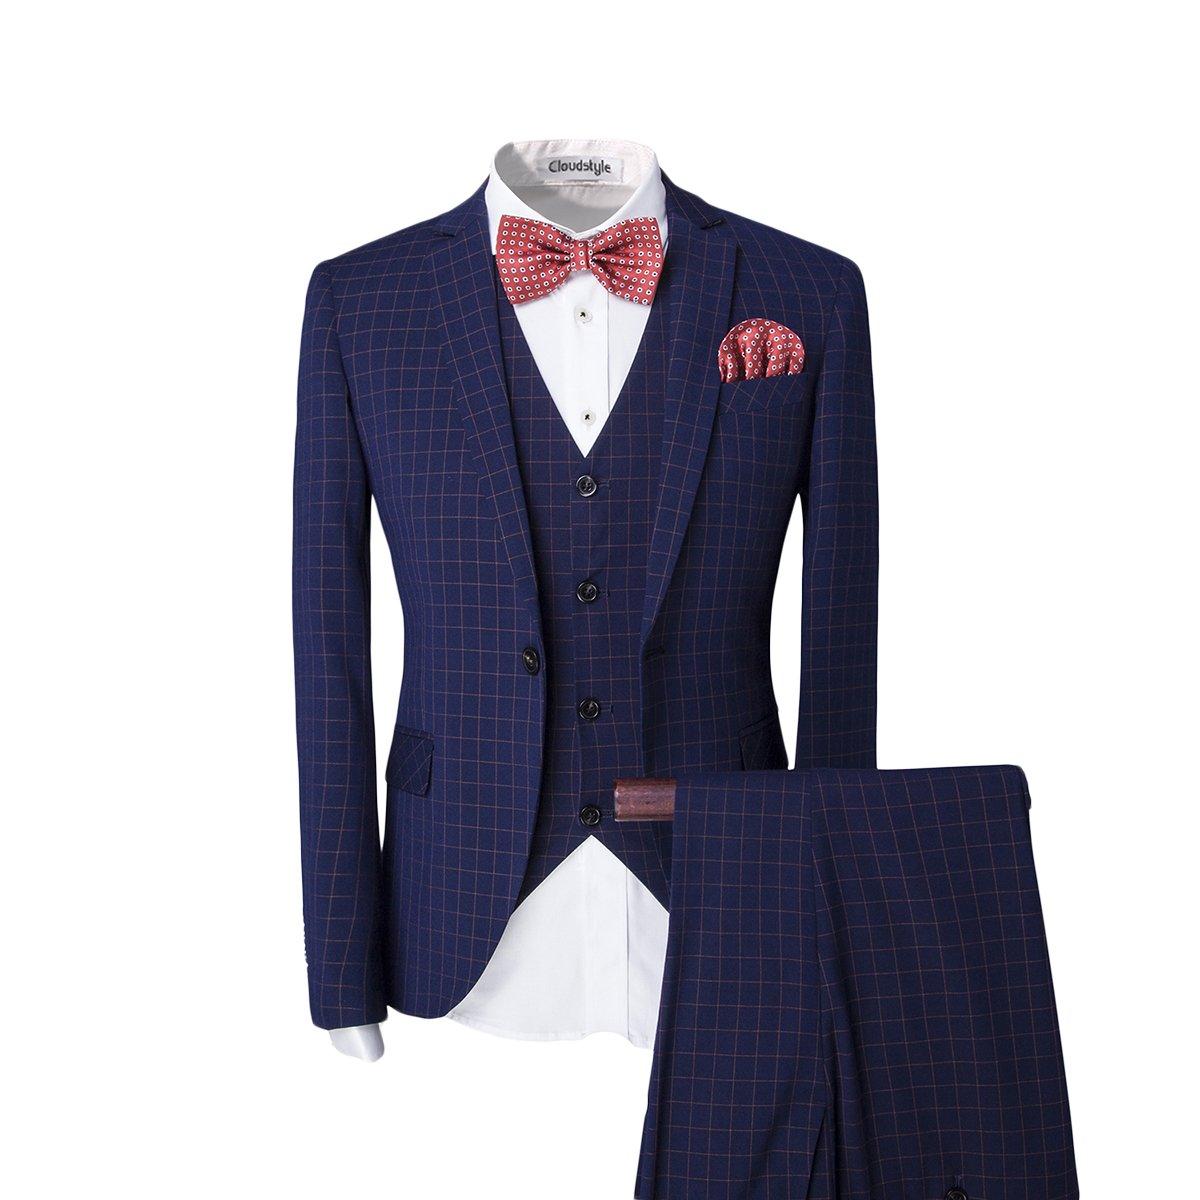 Men's One-Button Designer Luxurious Suits Plaid Tuxedos 3-Piece Set (Medium, Navy) by Cloudstyle